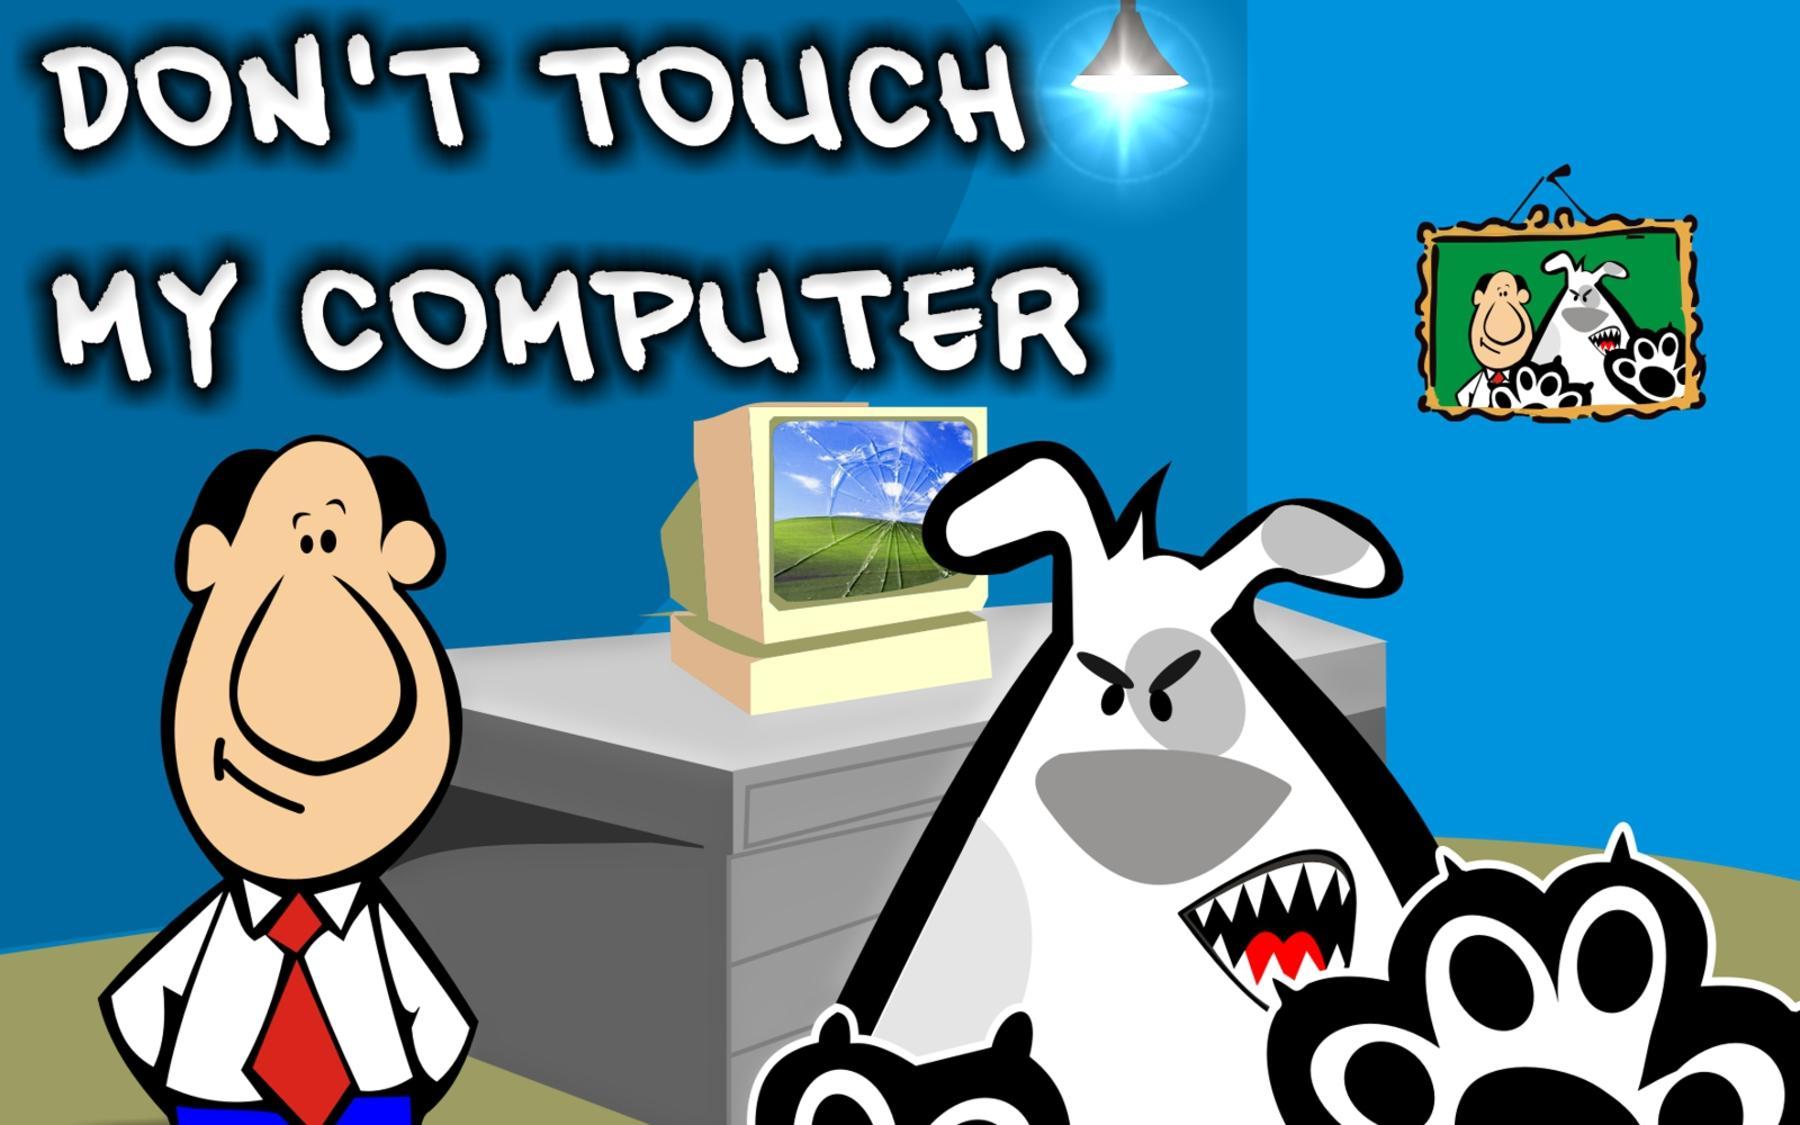 Funny 3d Cartoon Wallpapers: Funny 3D Cartoon Wallpapers